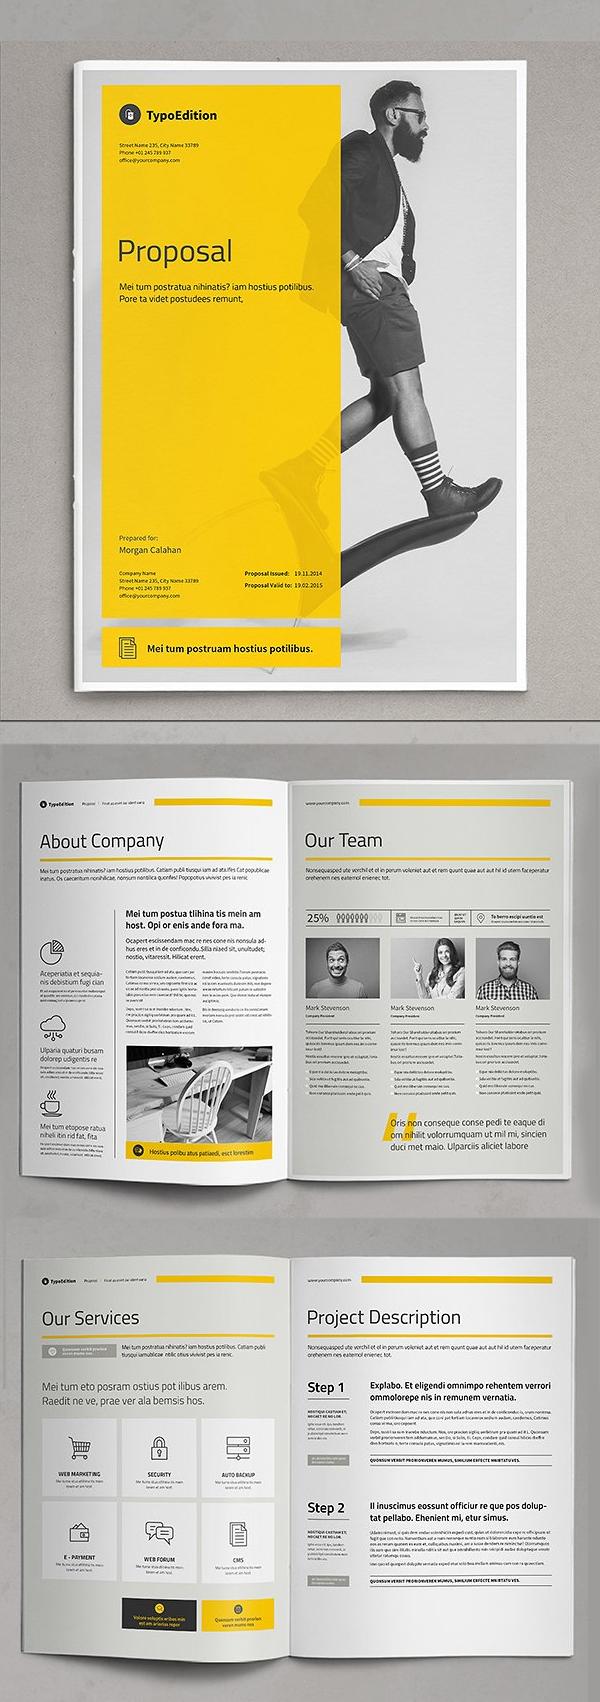 Professional Business Proposal Templates Design - 3